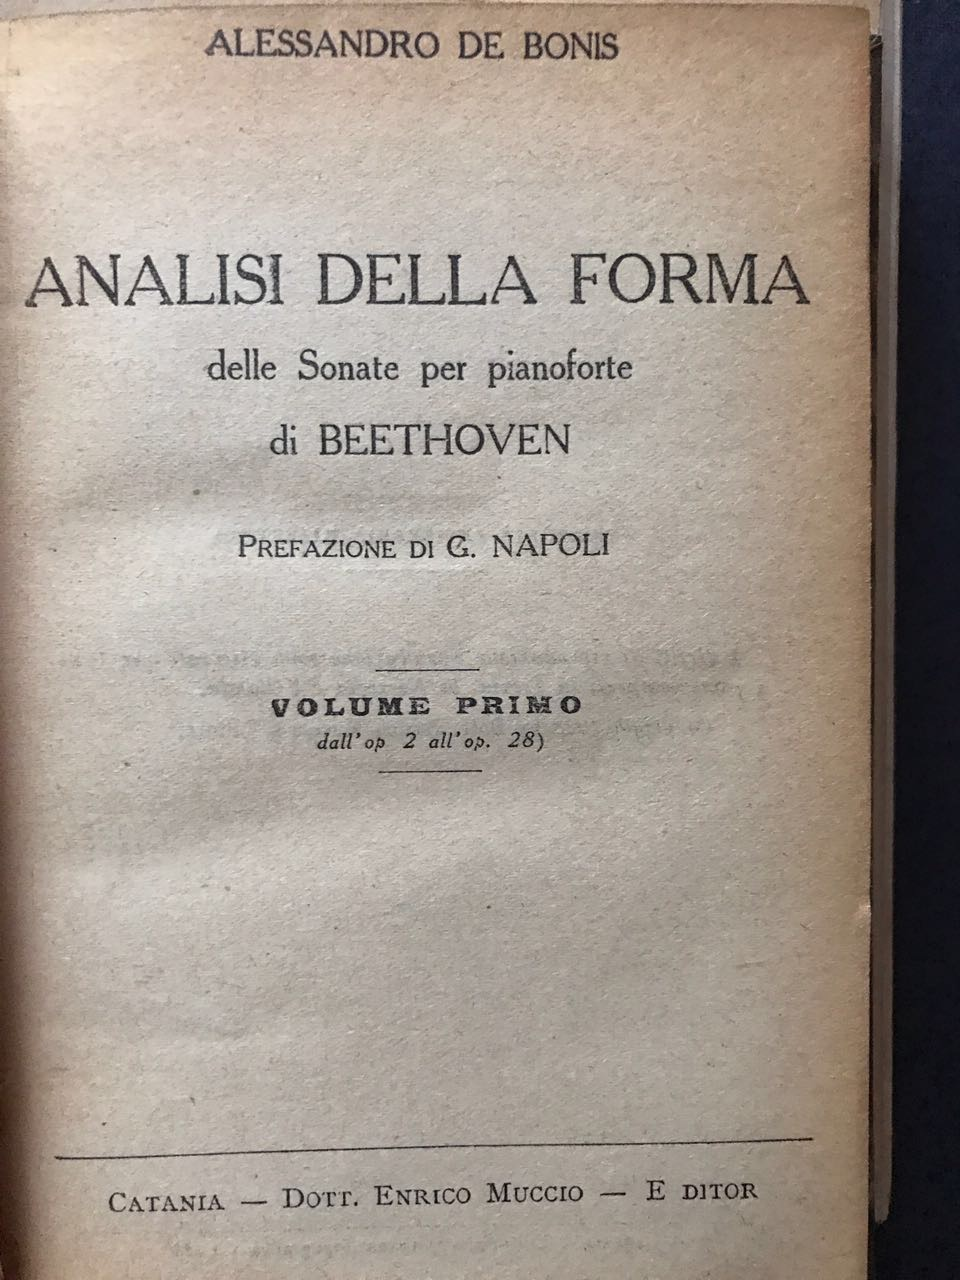 De Bonis Alessandro